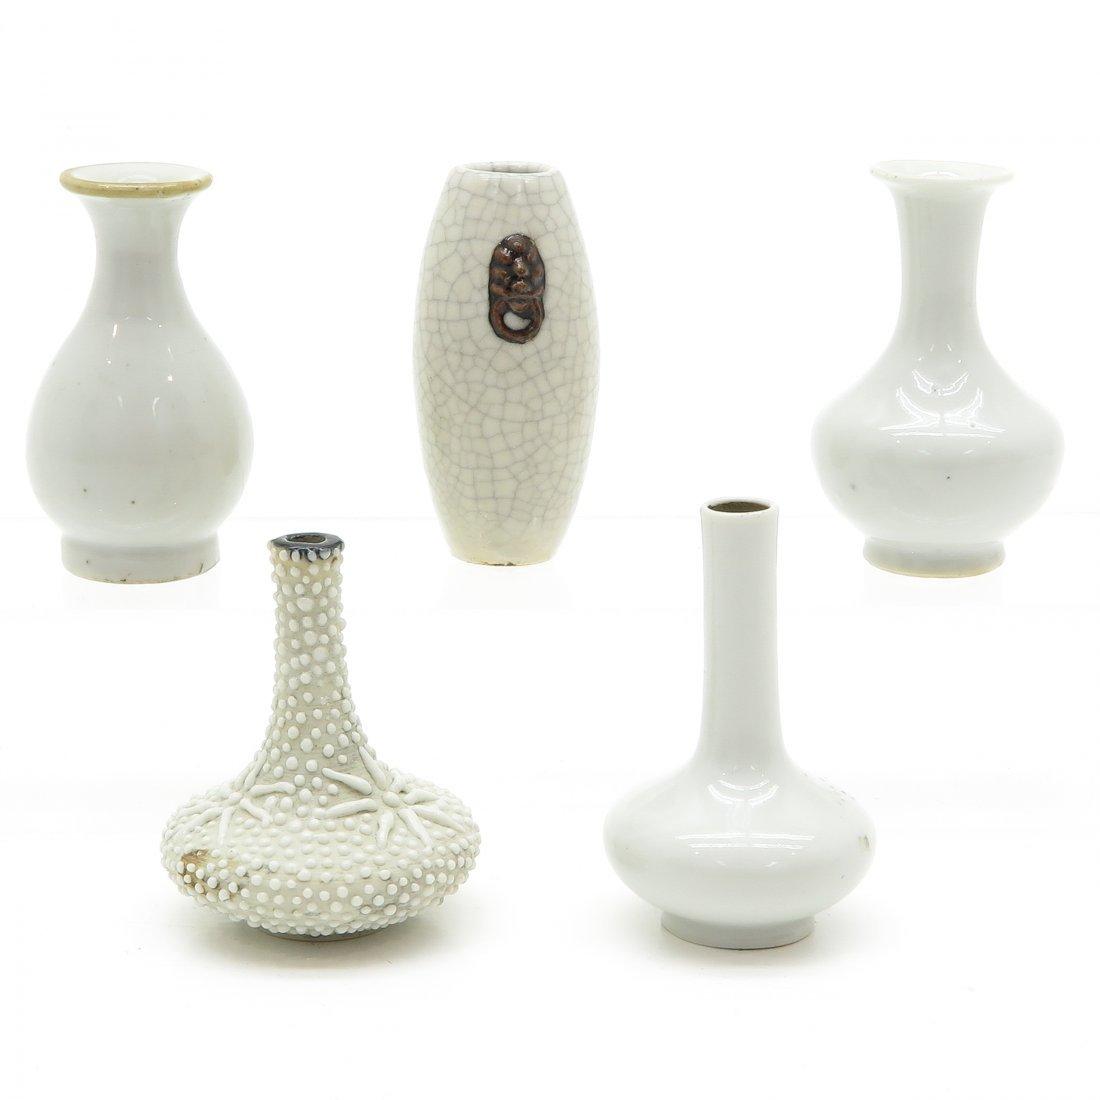 Lot of 5 China Porcelain Miniature Vases - 2